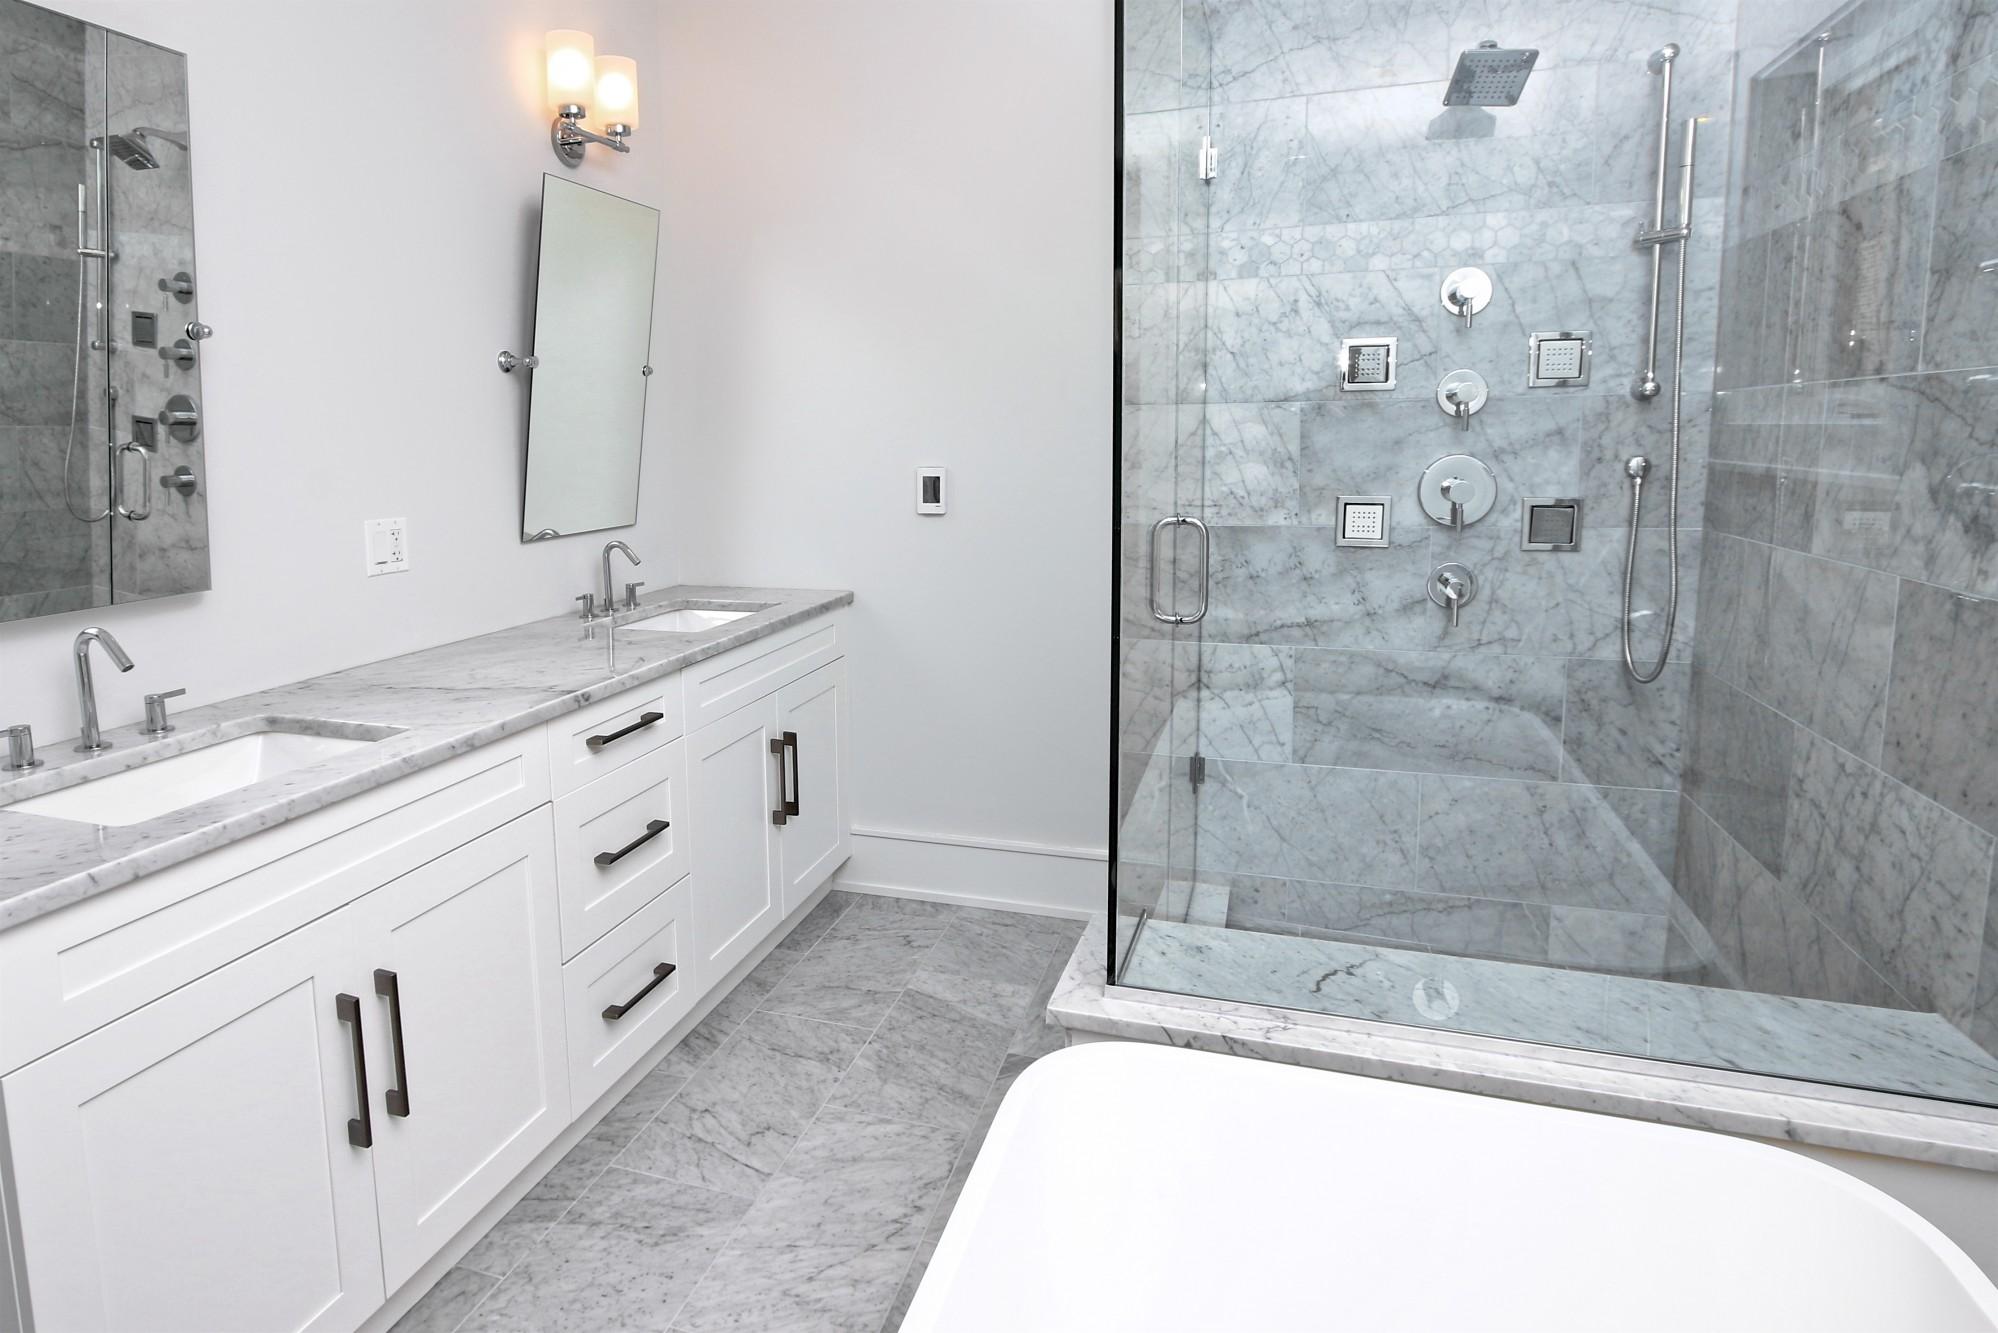 Kitchen & Bath Cabinets Photo Slideshow | Kitchen Cabinets ...